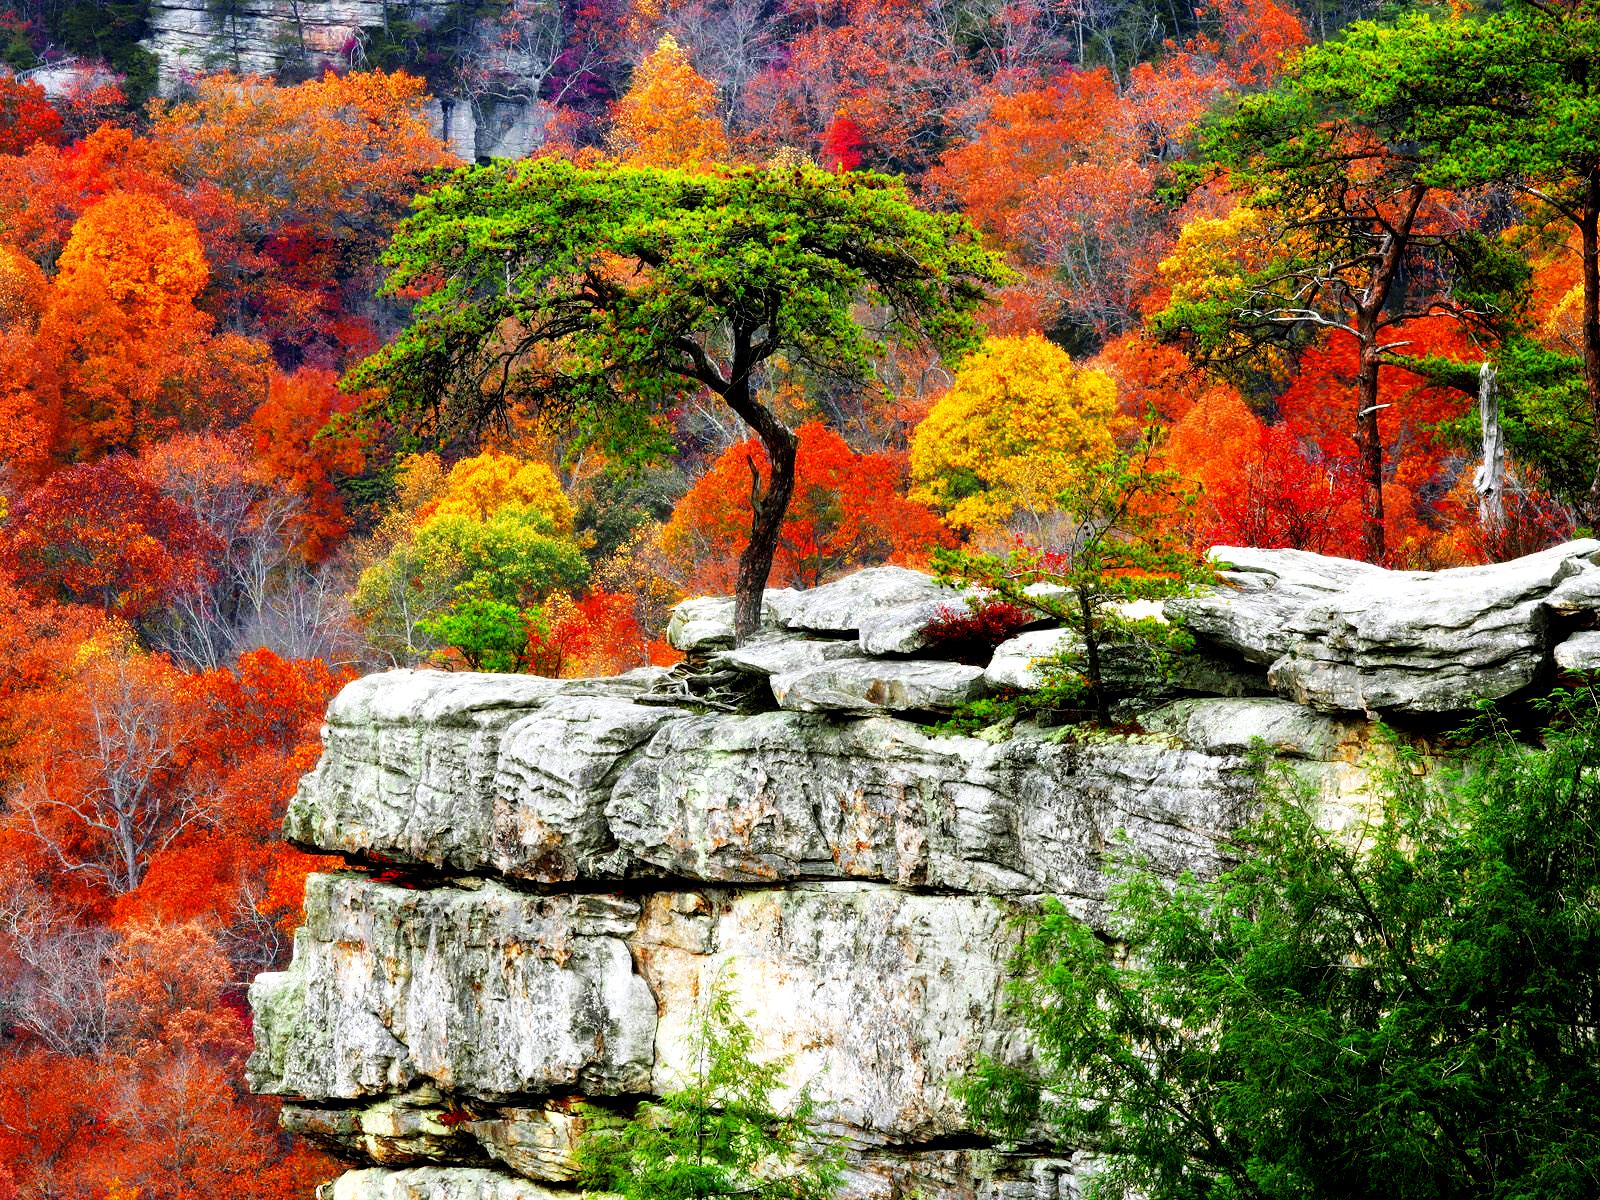 64 Free Wallpaper Backgrounds Download On Wallpapersafari